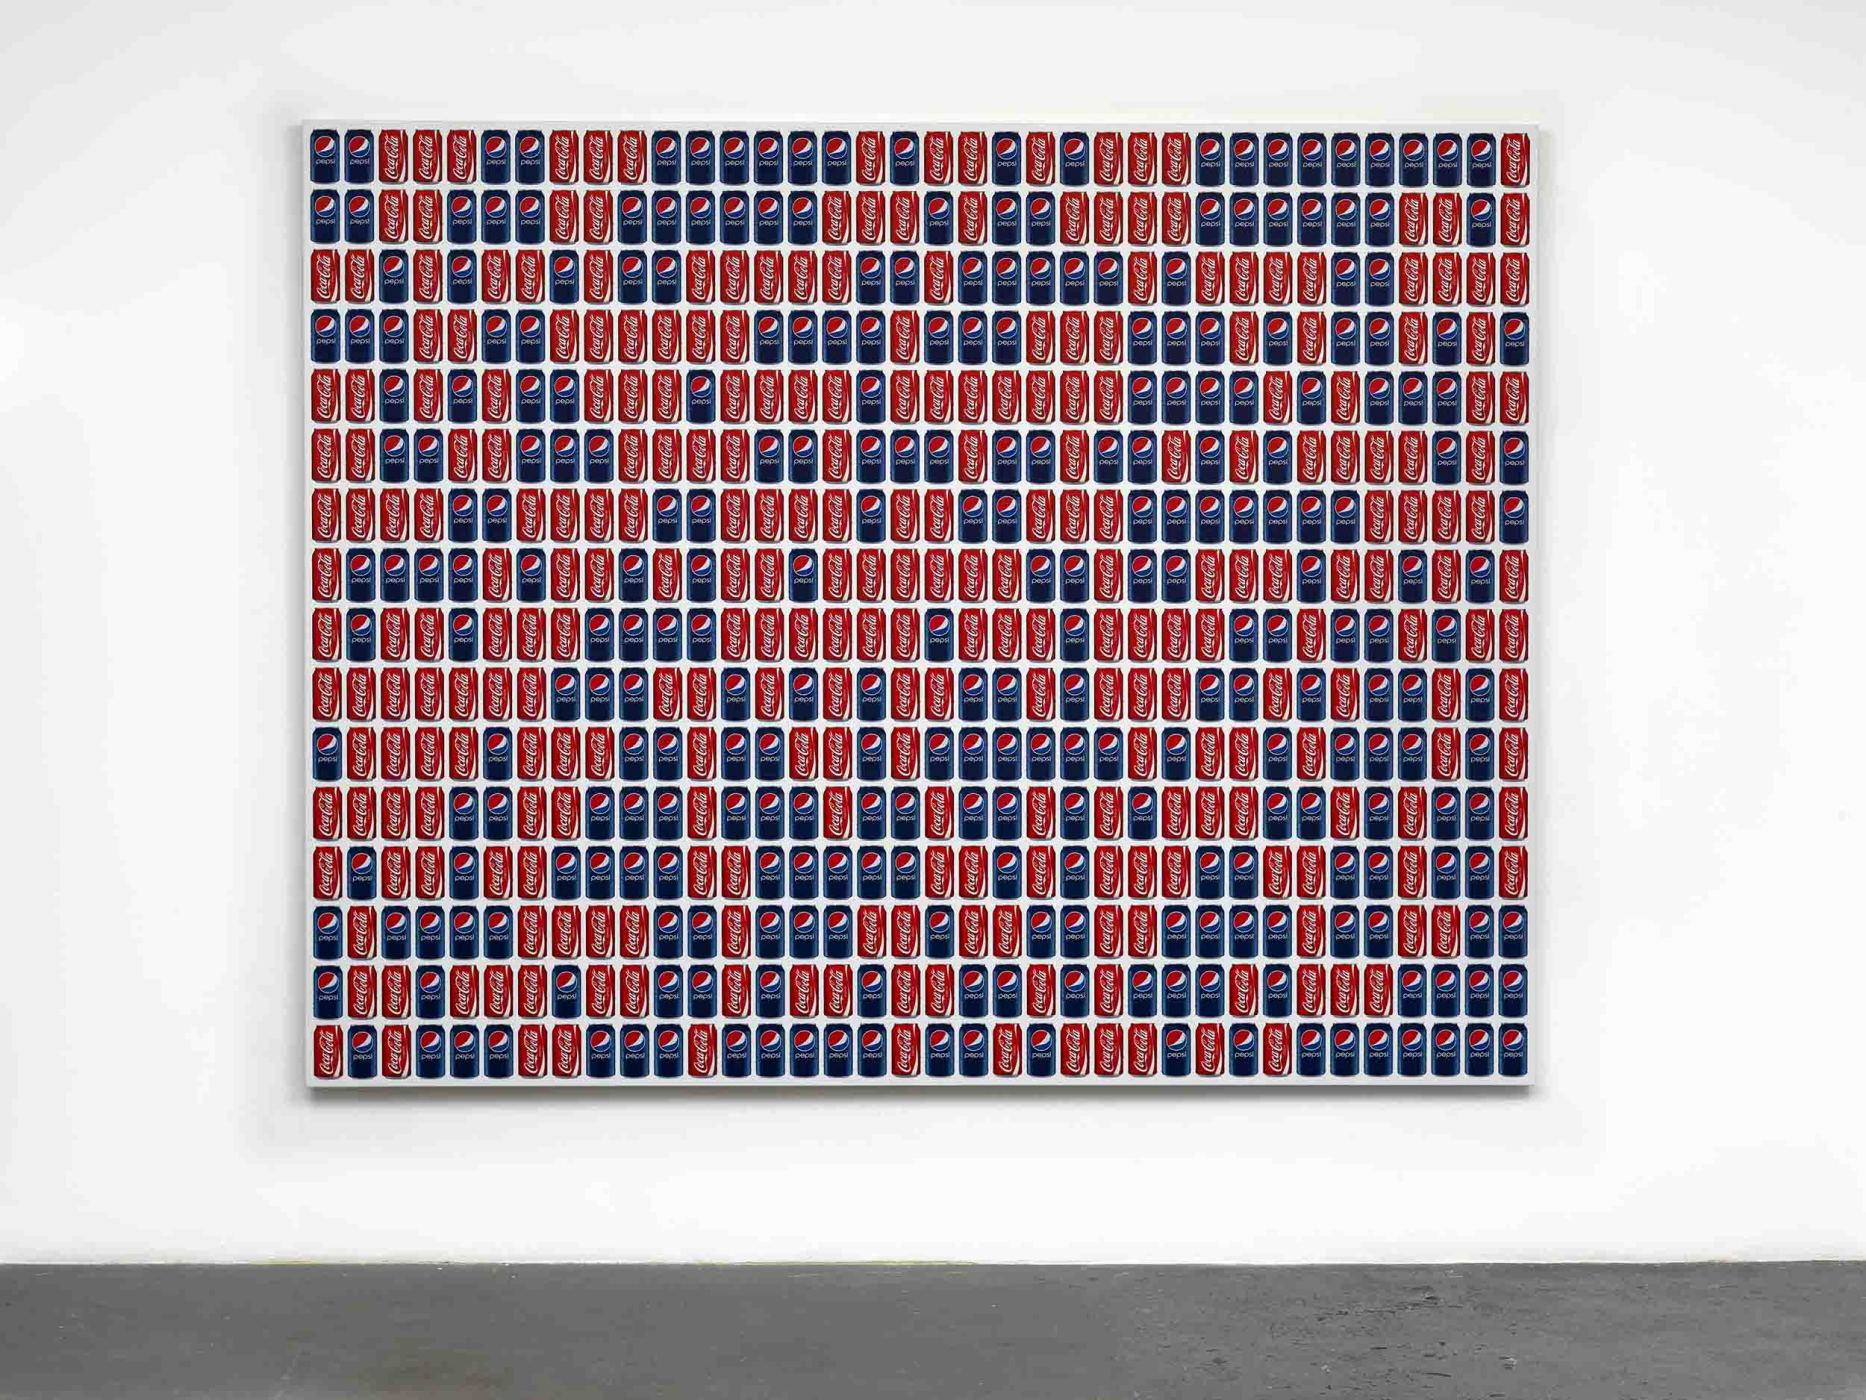 "<div class=""title""><em>Coke/Pepsi</em>, 2013</div><div class=""medium"">UV ink on vinyl</div><div class=""dimensions"">216.0 x 272.0 x 4.0 cm<br />85 x 107 1/16 x 1 9/16 in.</div>"